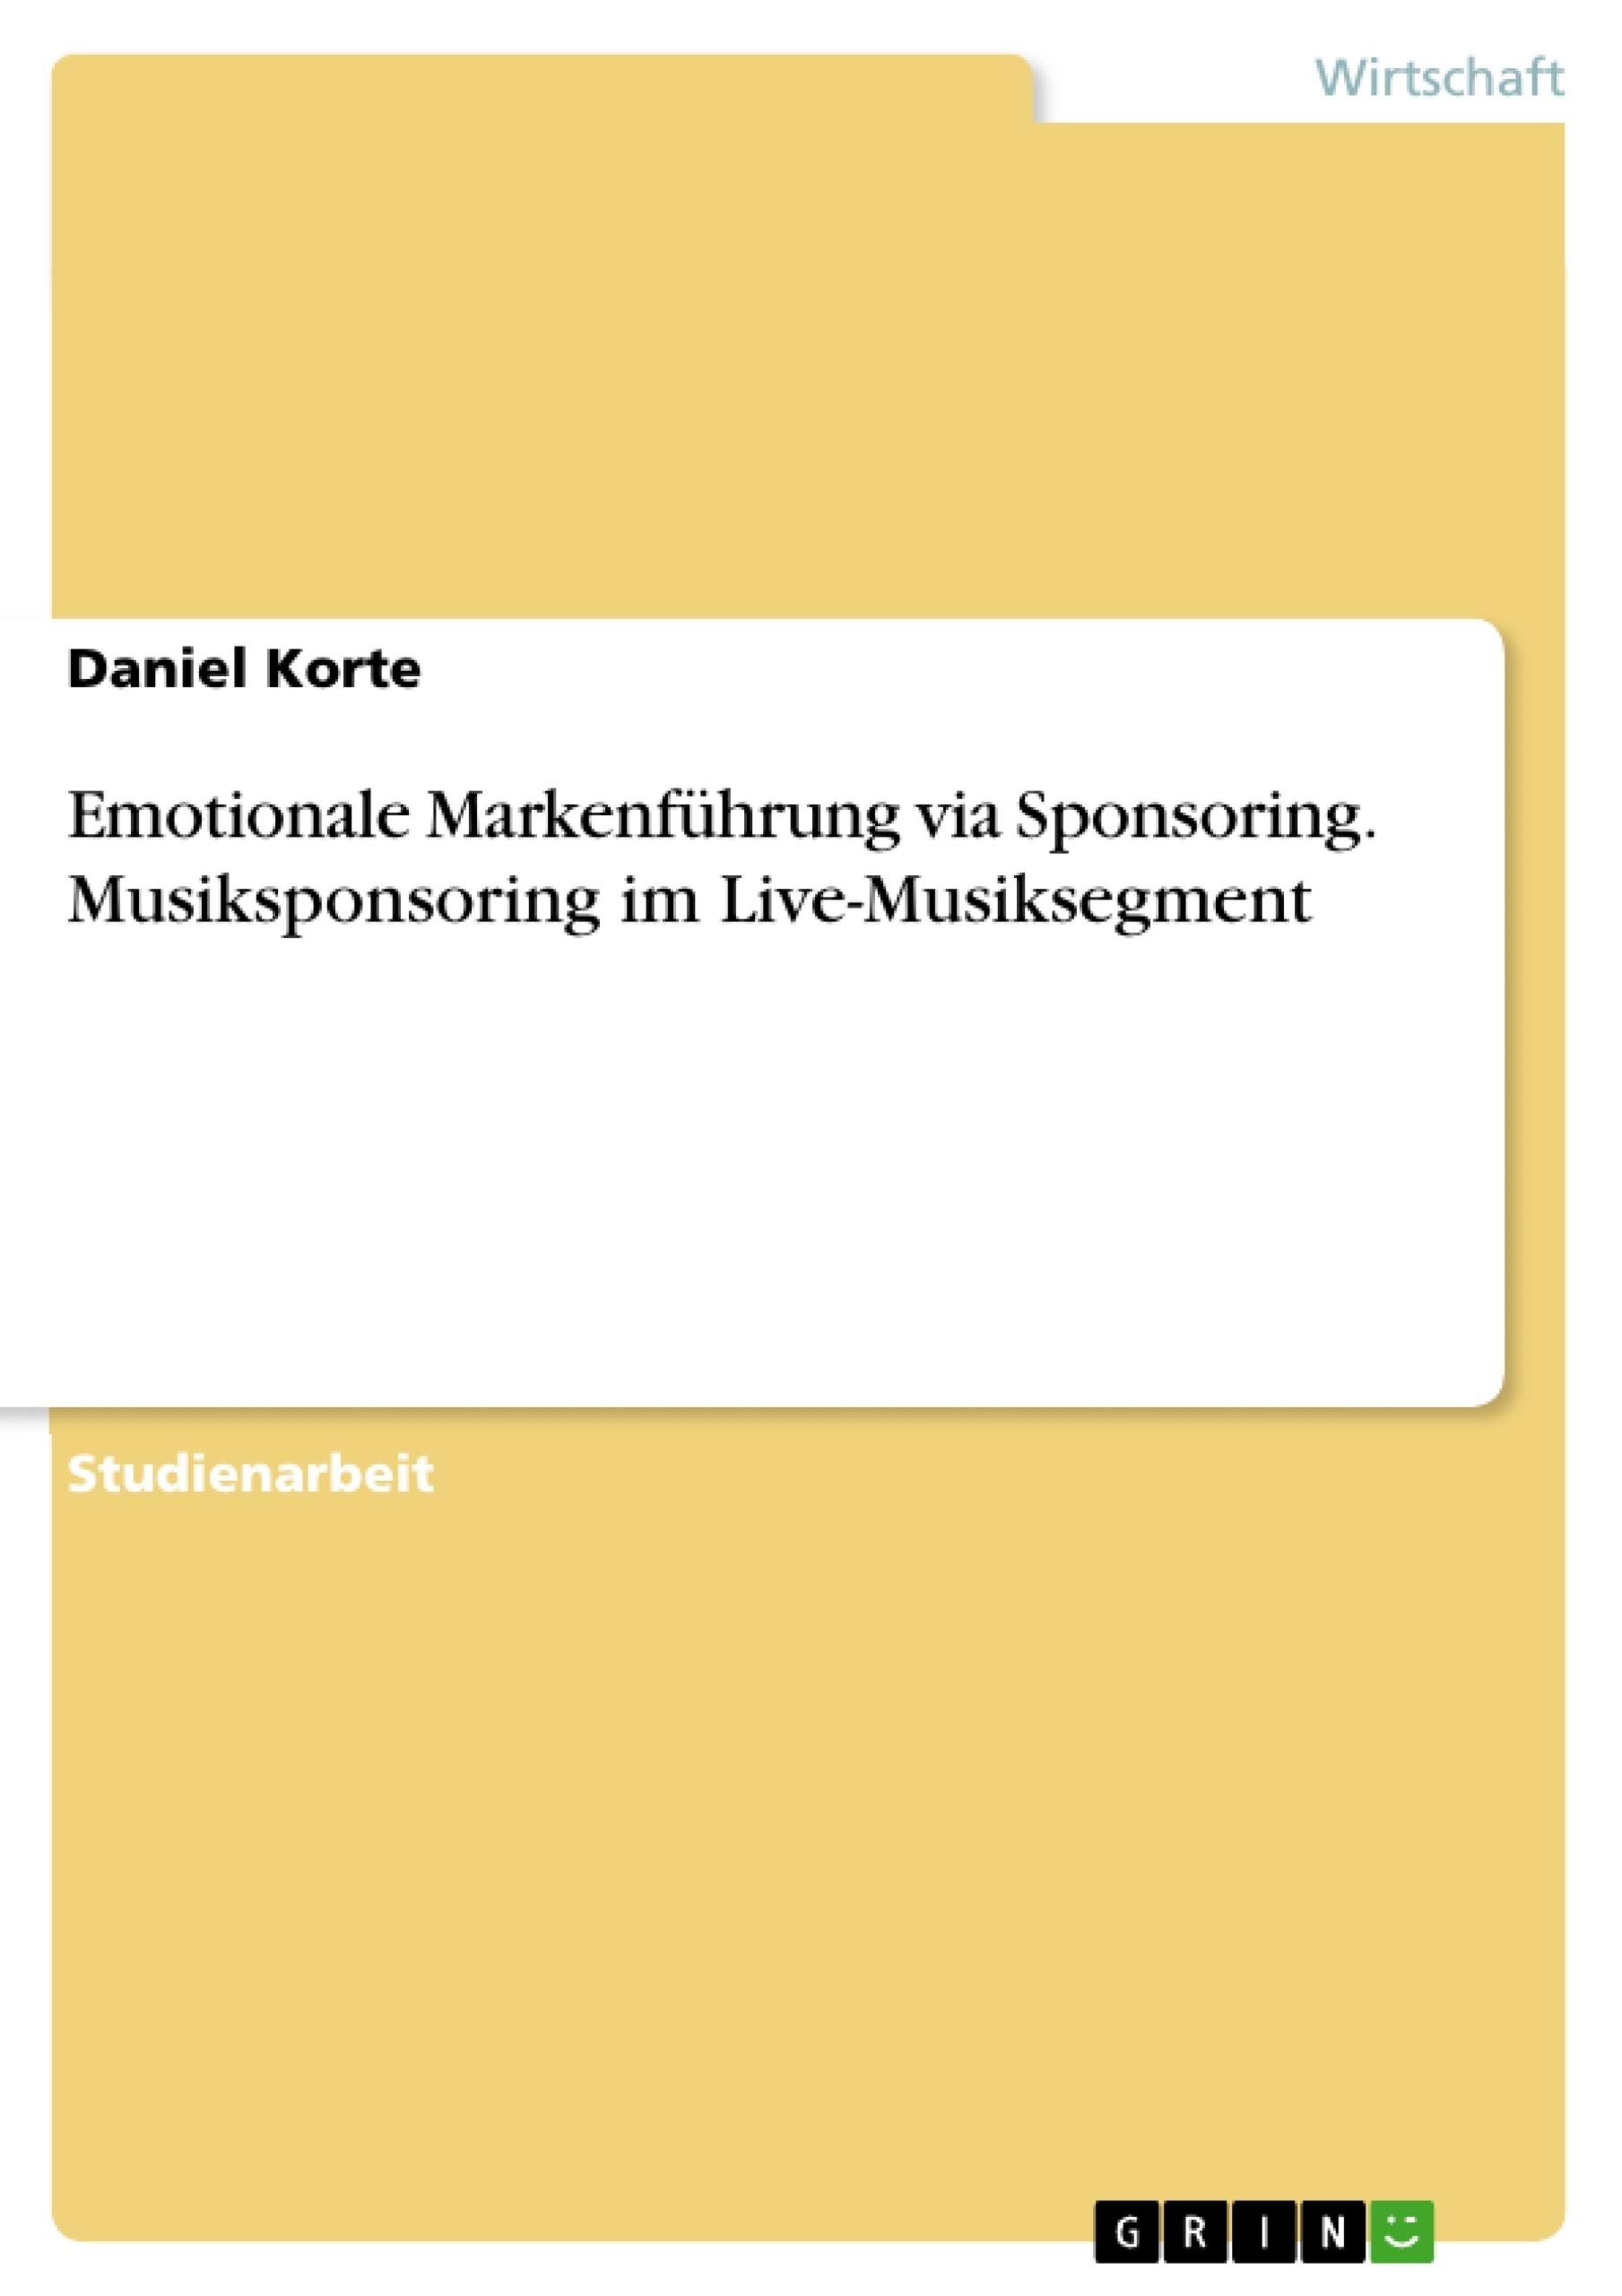 Titel: Emotionale Markenführung via Sponsoring. Musiksponsoring im Live-Musiksegment